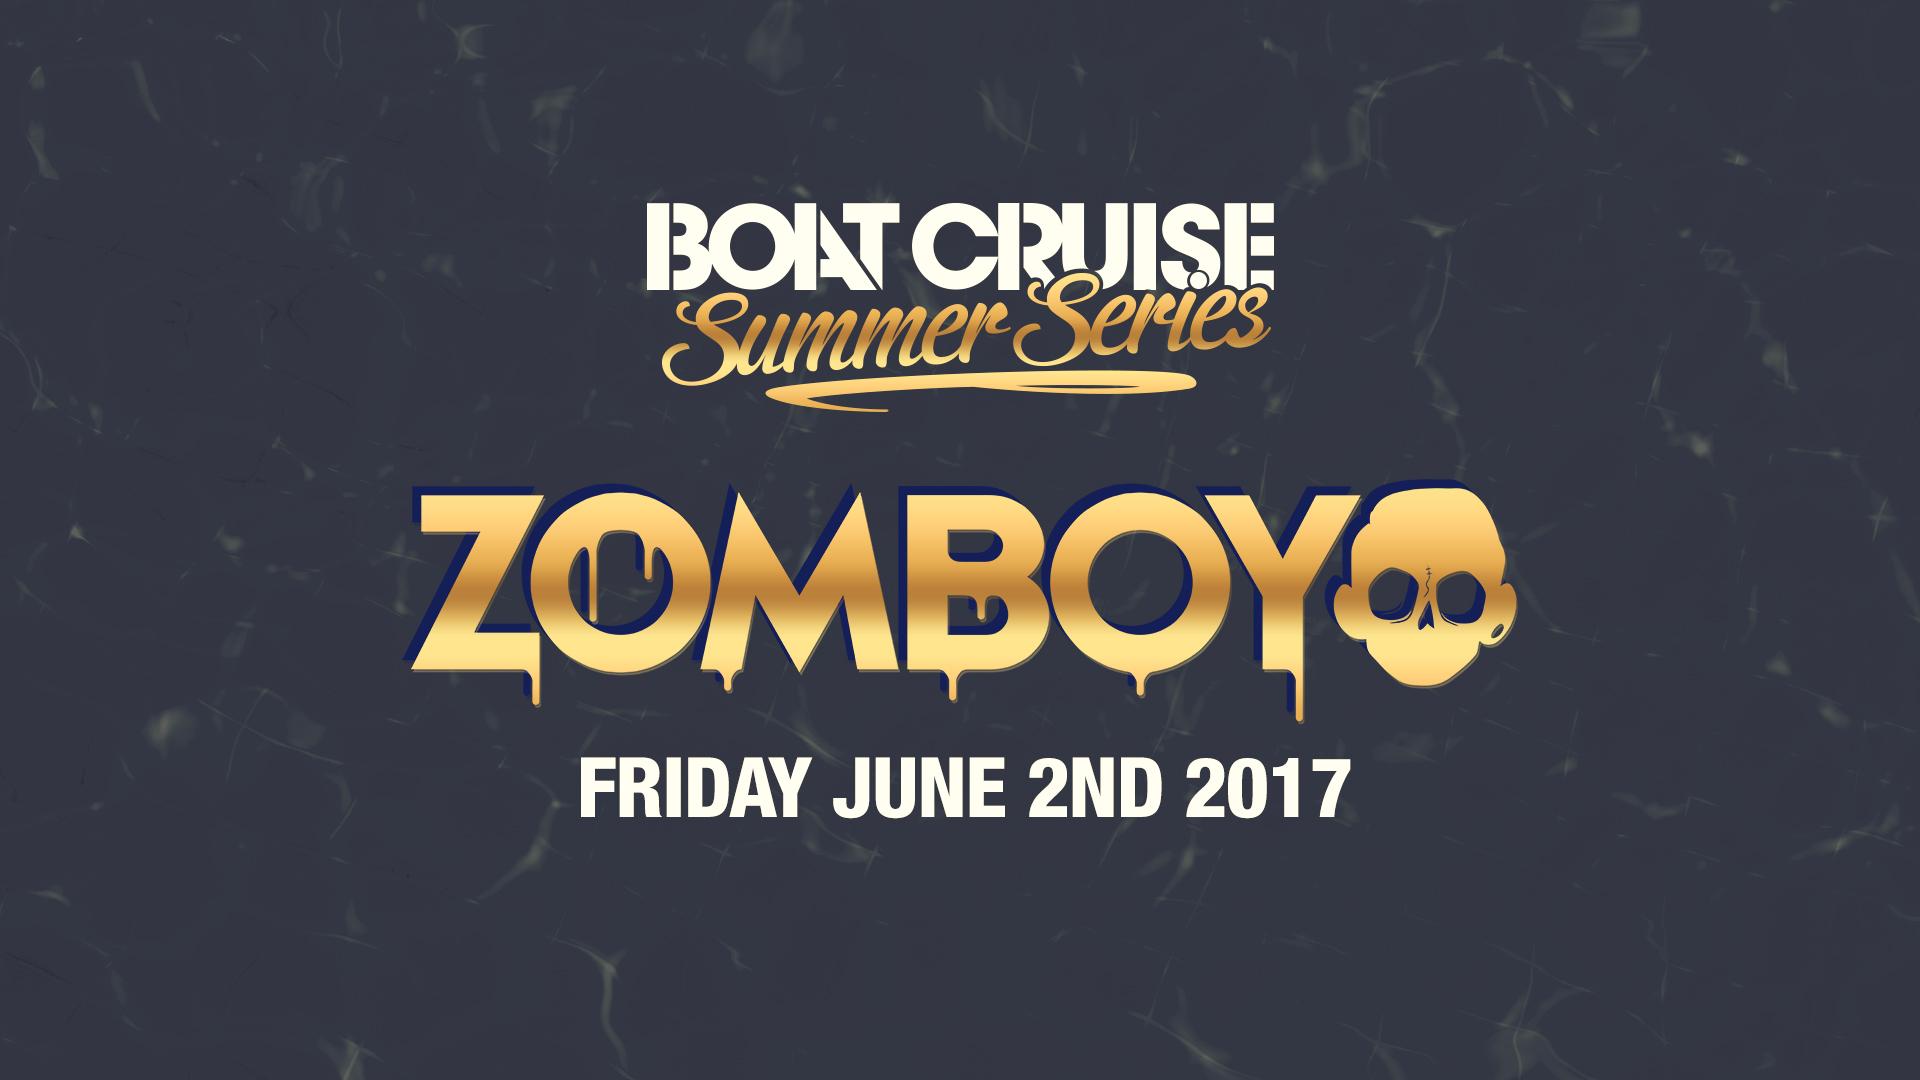 Bcss Zomboy Cruise June 2nd 2017 Flavor Media